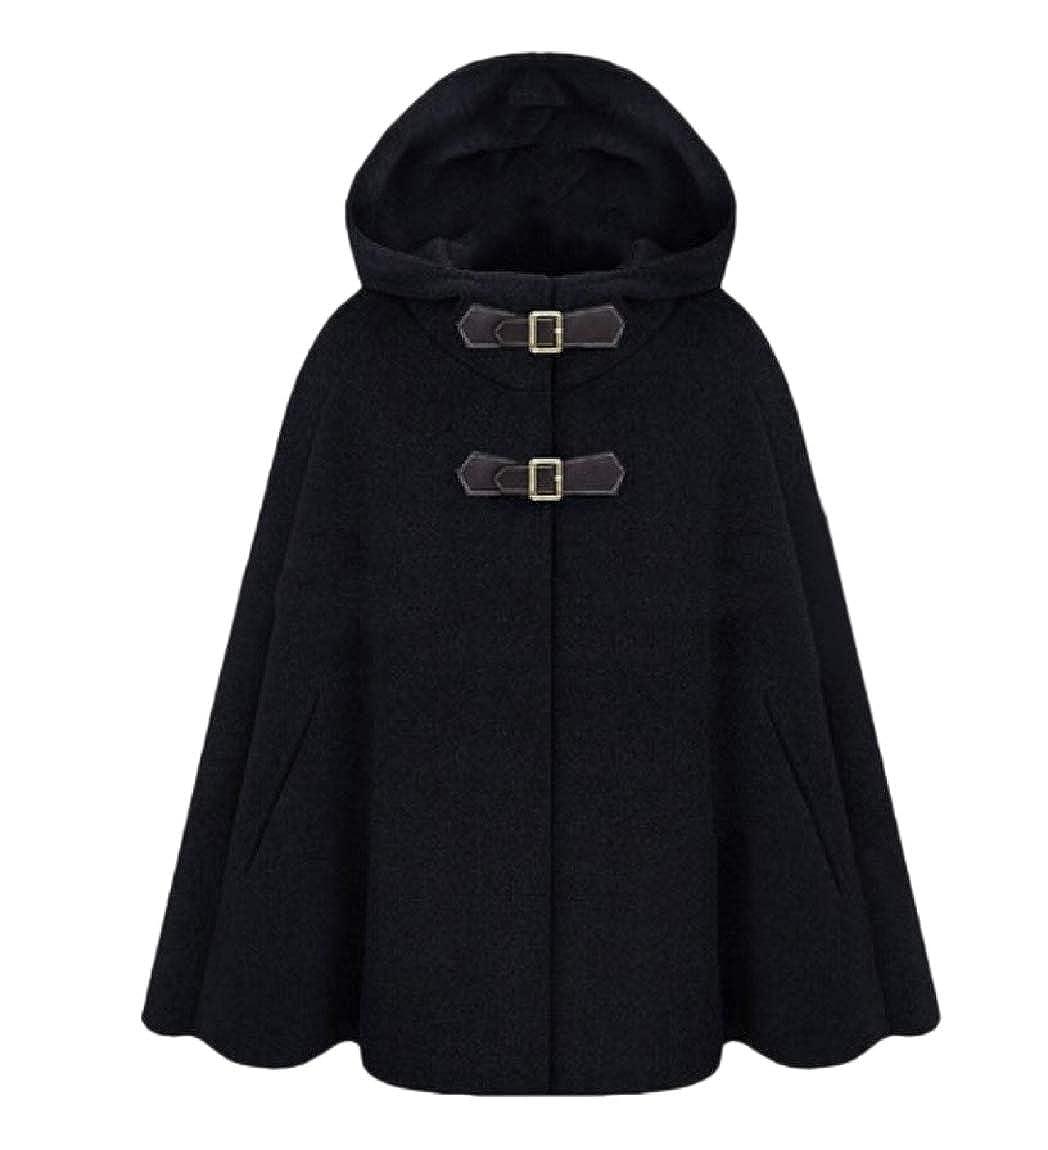 YUNY Womens Classics Wool Blended Stylish Poncho Brumal Duffle Coat Black XL